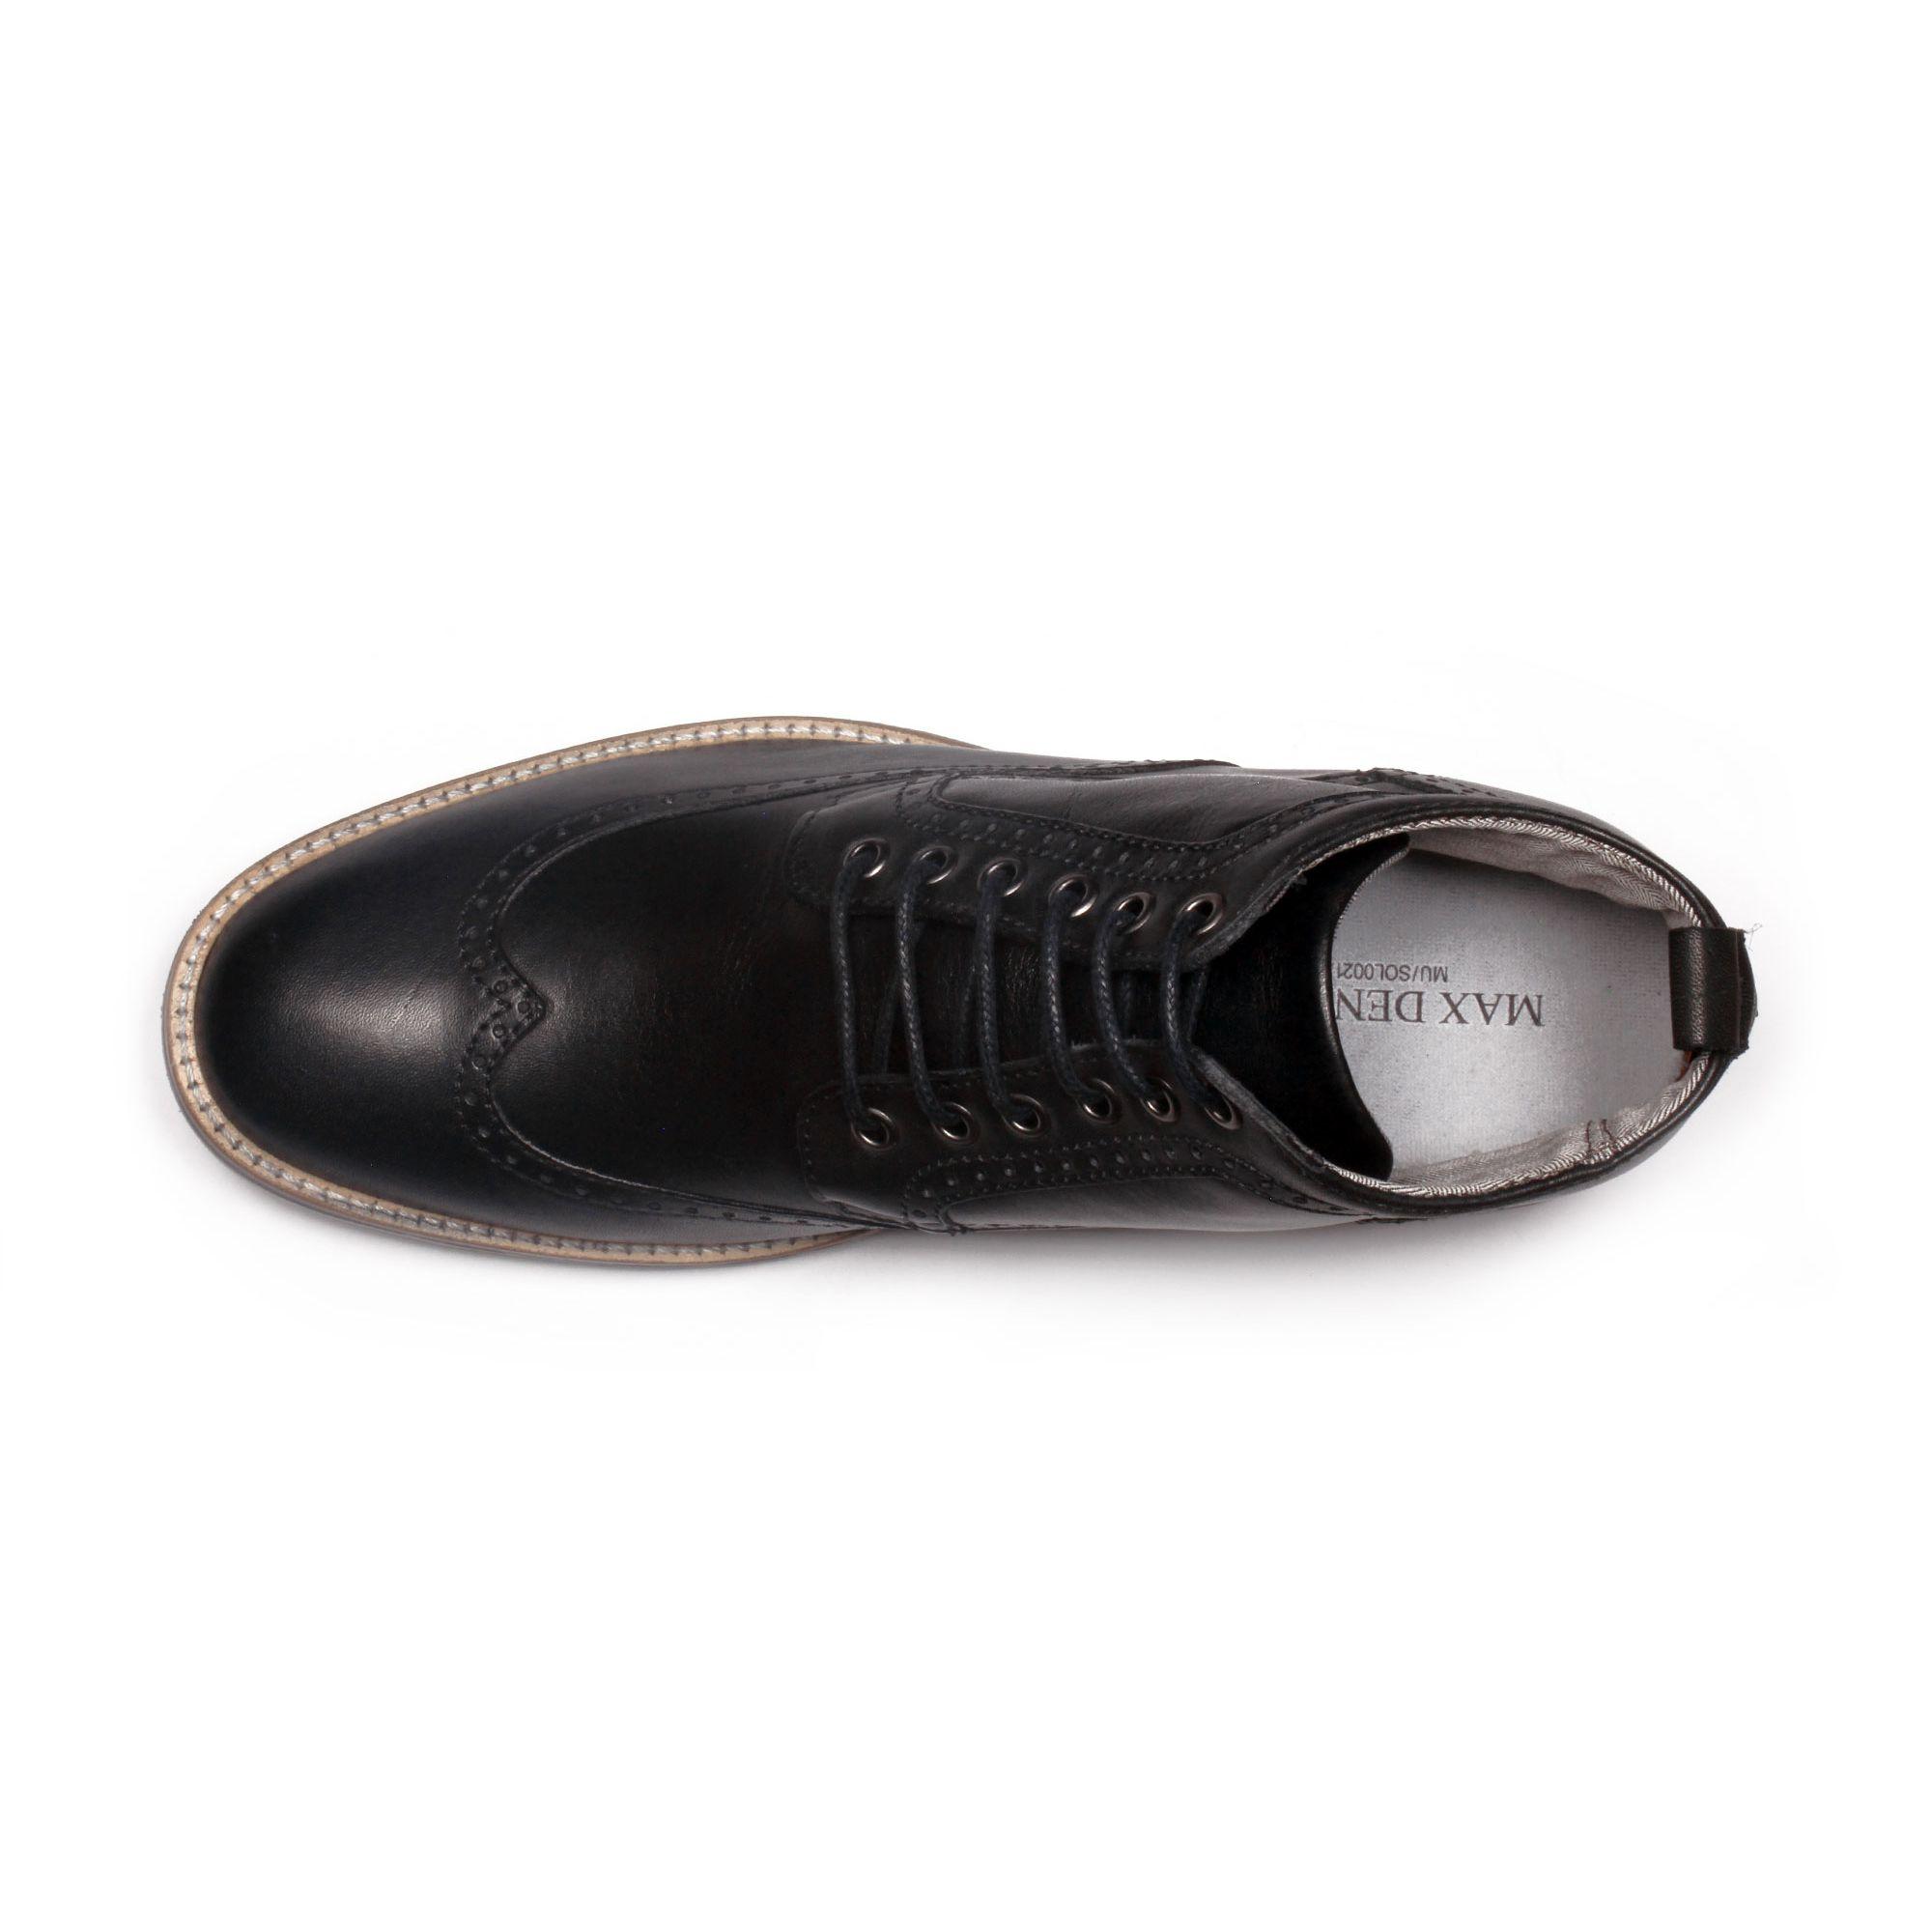 Botín Hipster Negro Max Denegri +7cms de Altura_70880